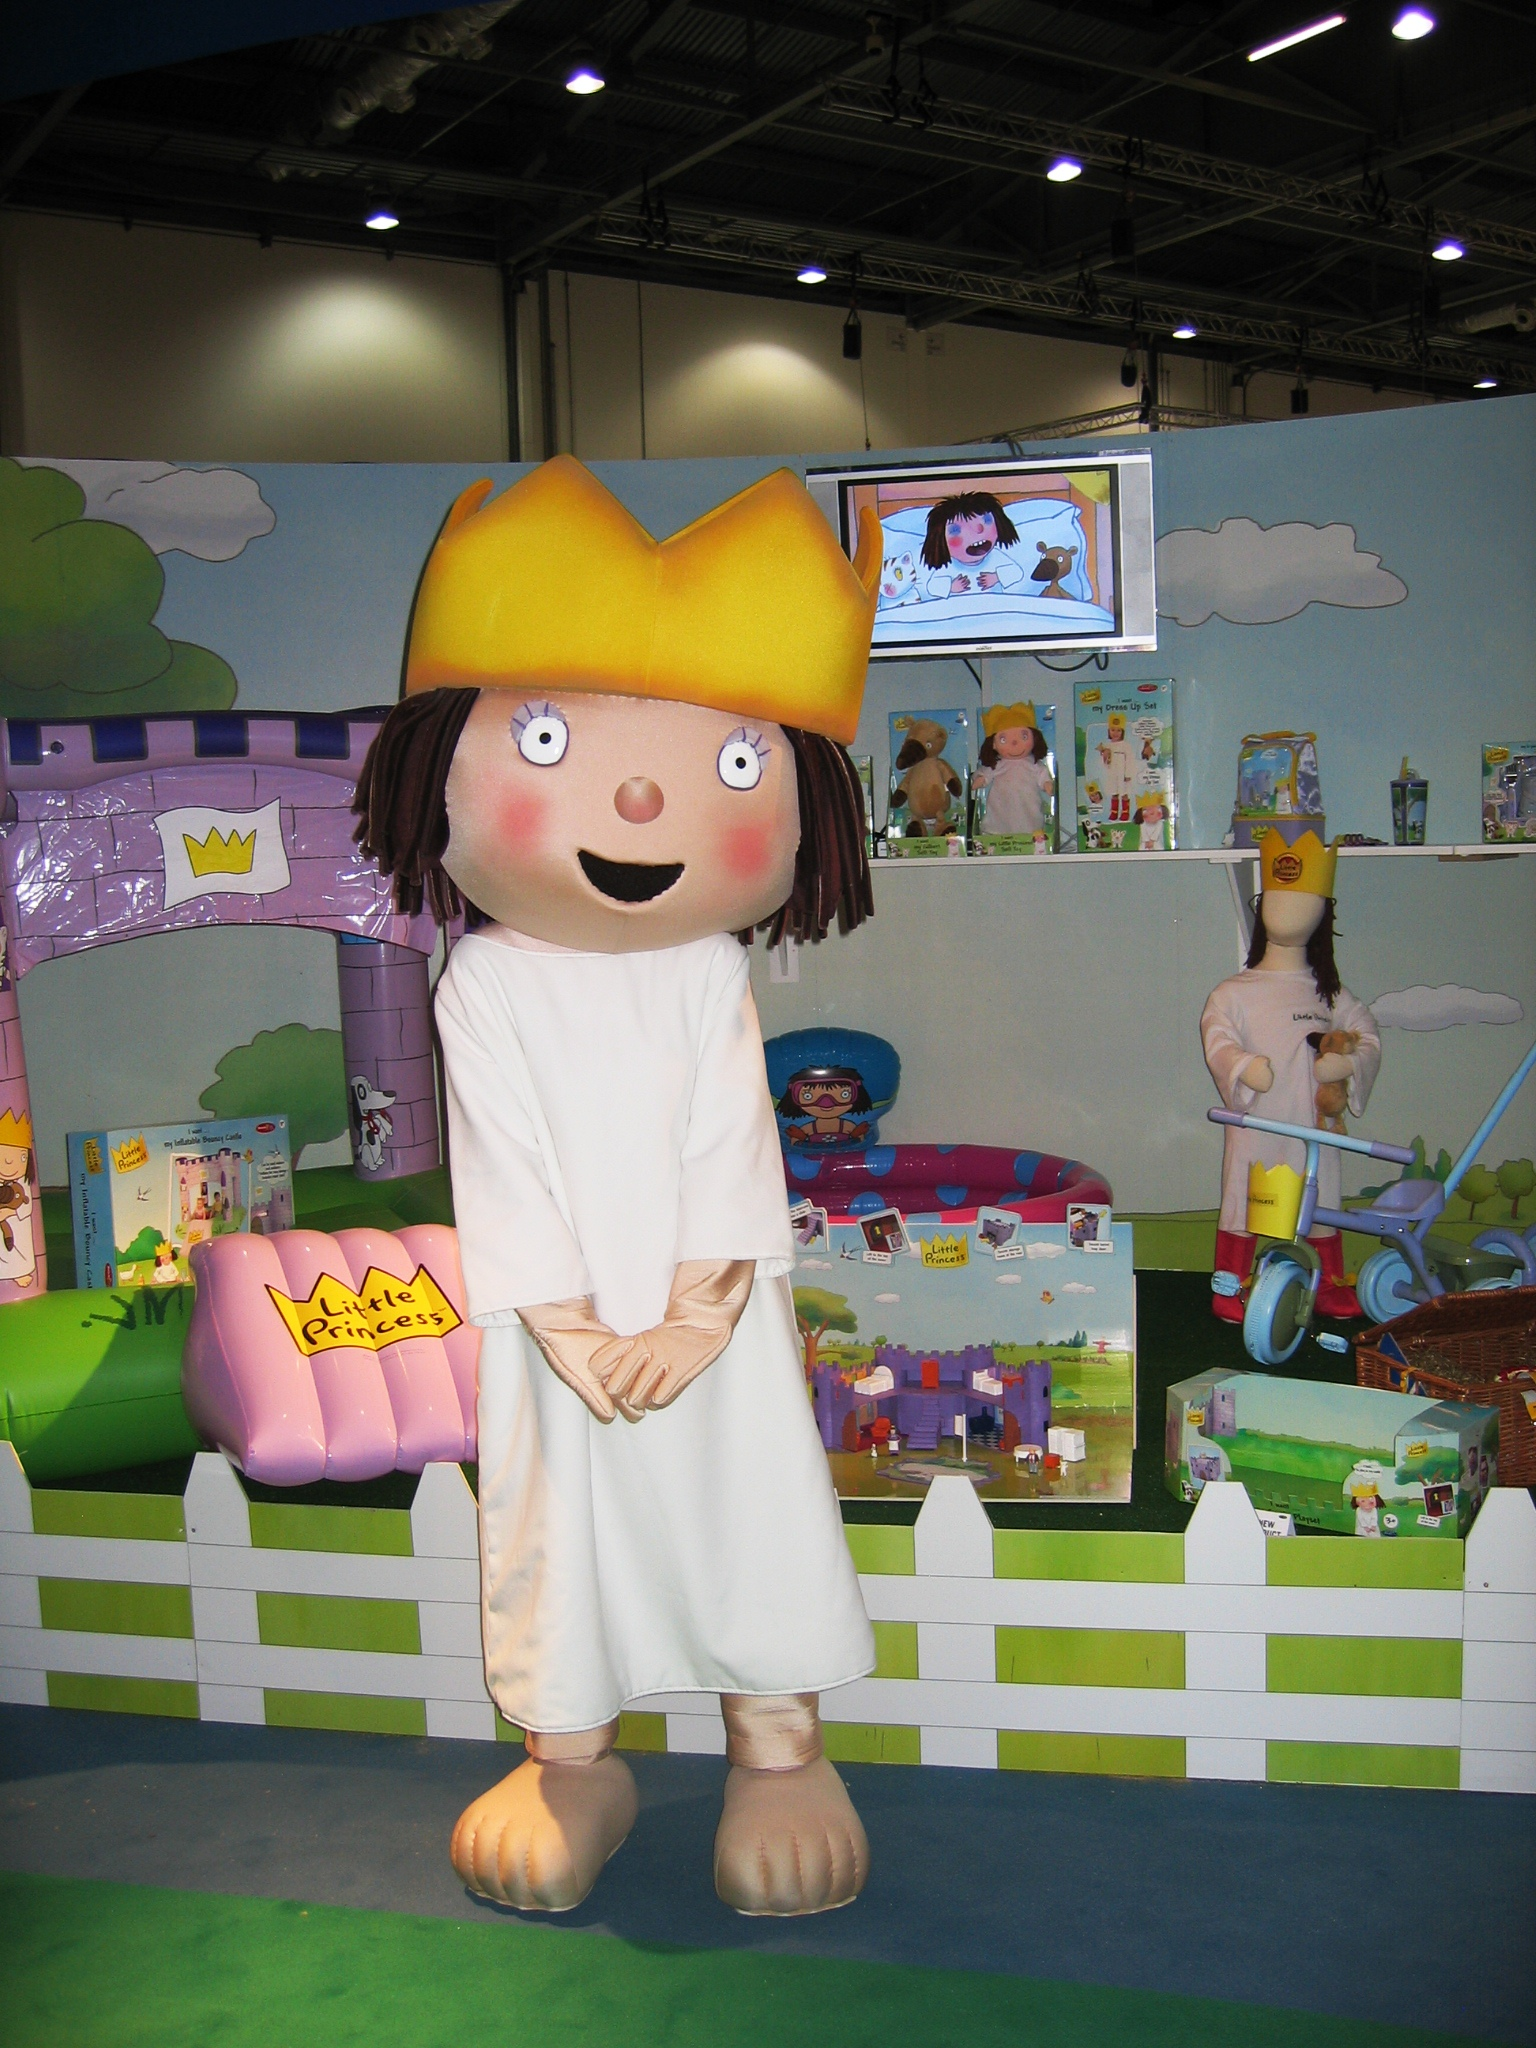 Little Princess mascot costume